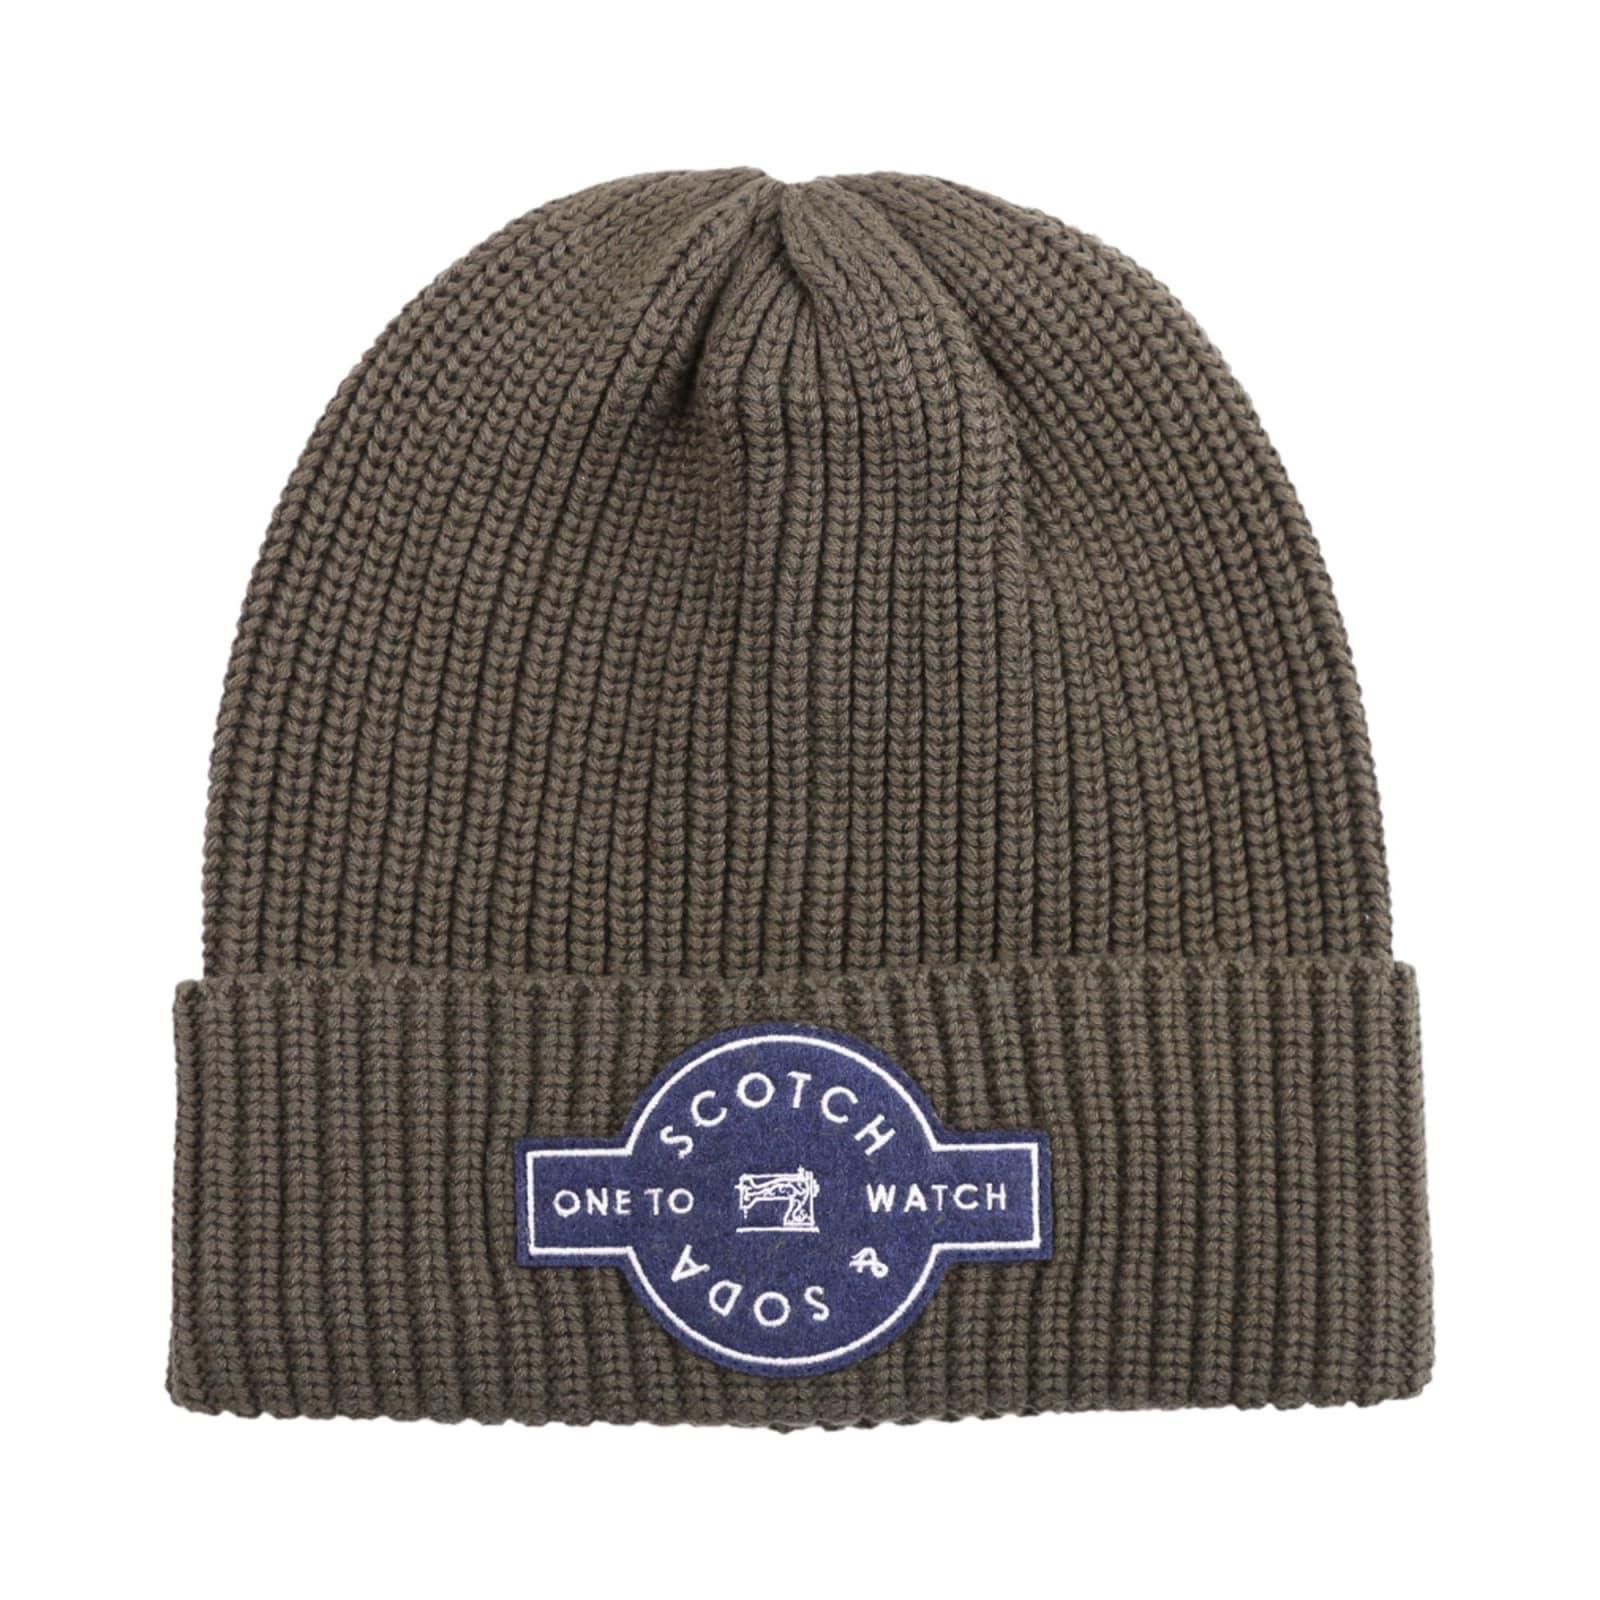 867d2b956 Scotch&soda Cotton Hat